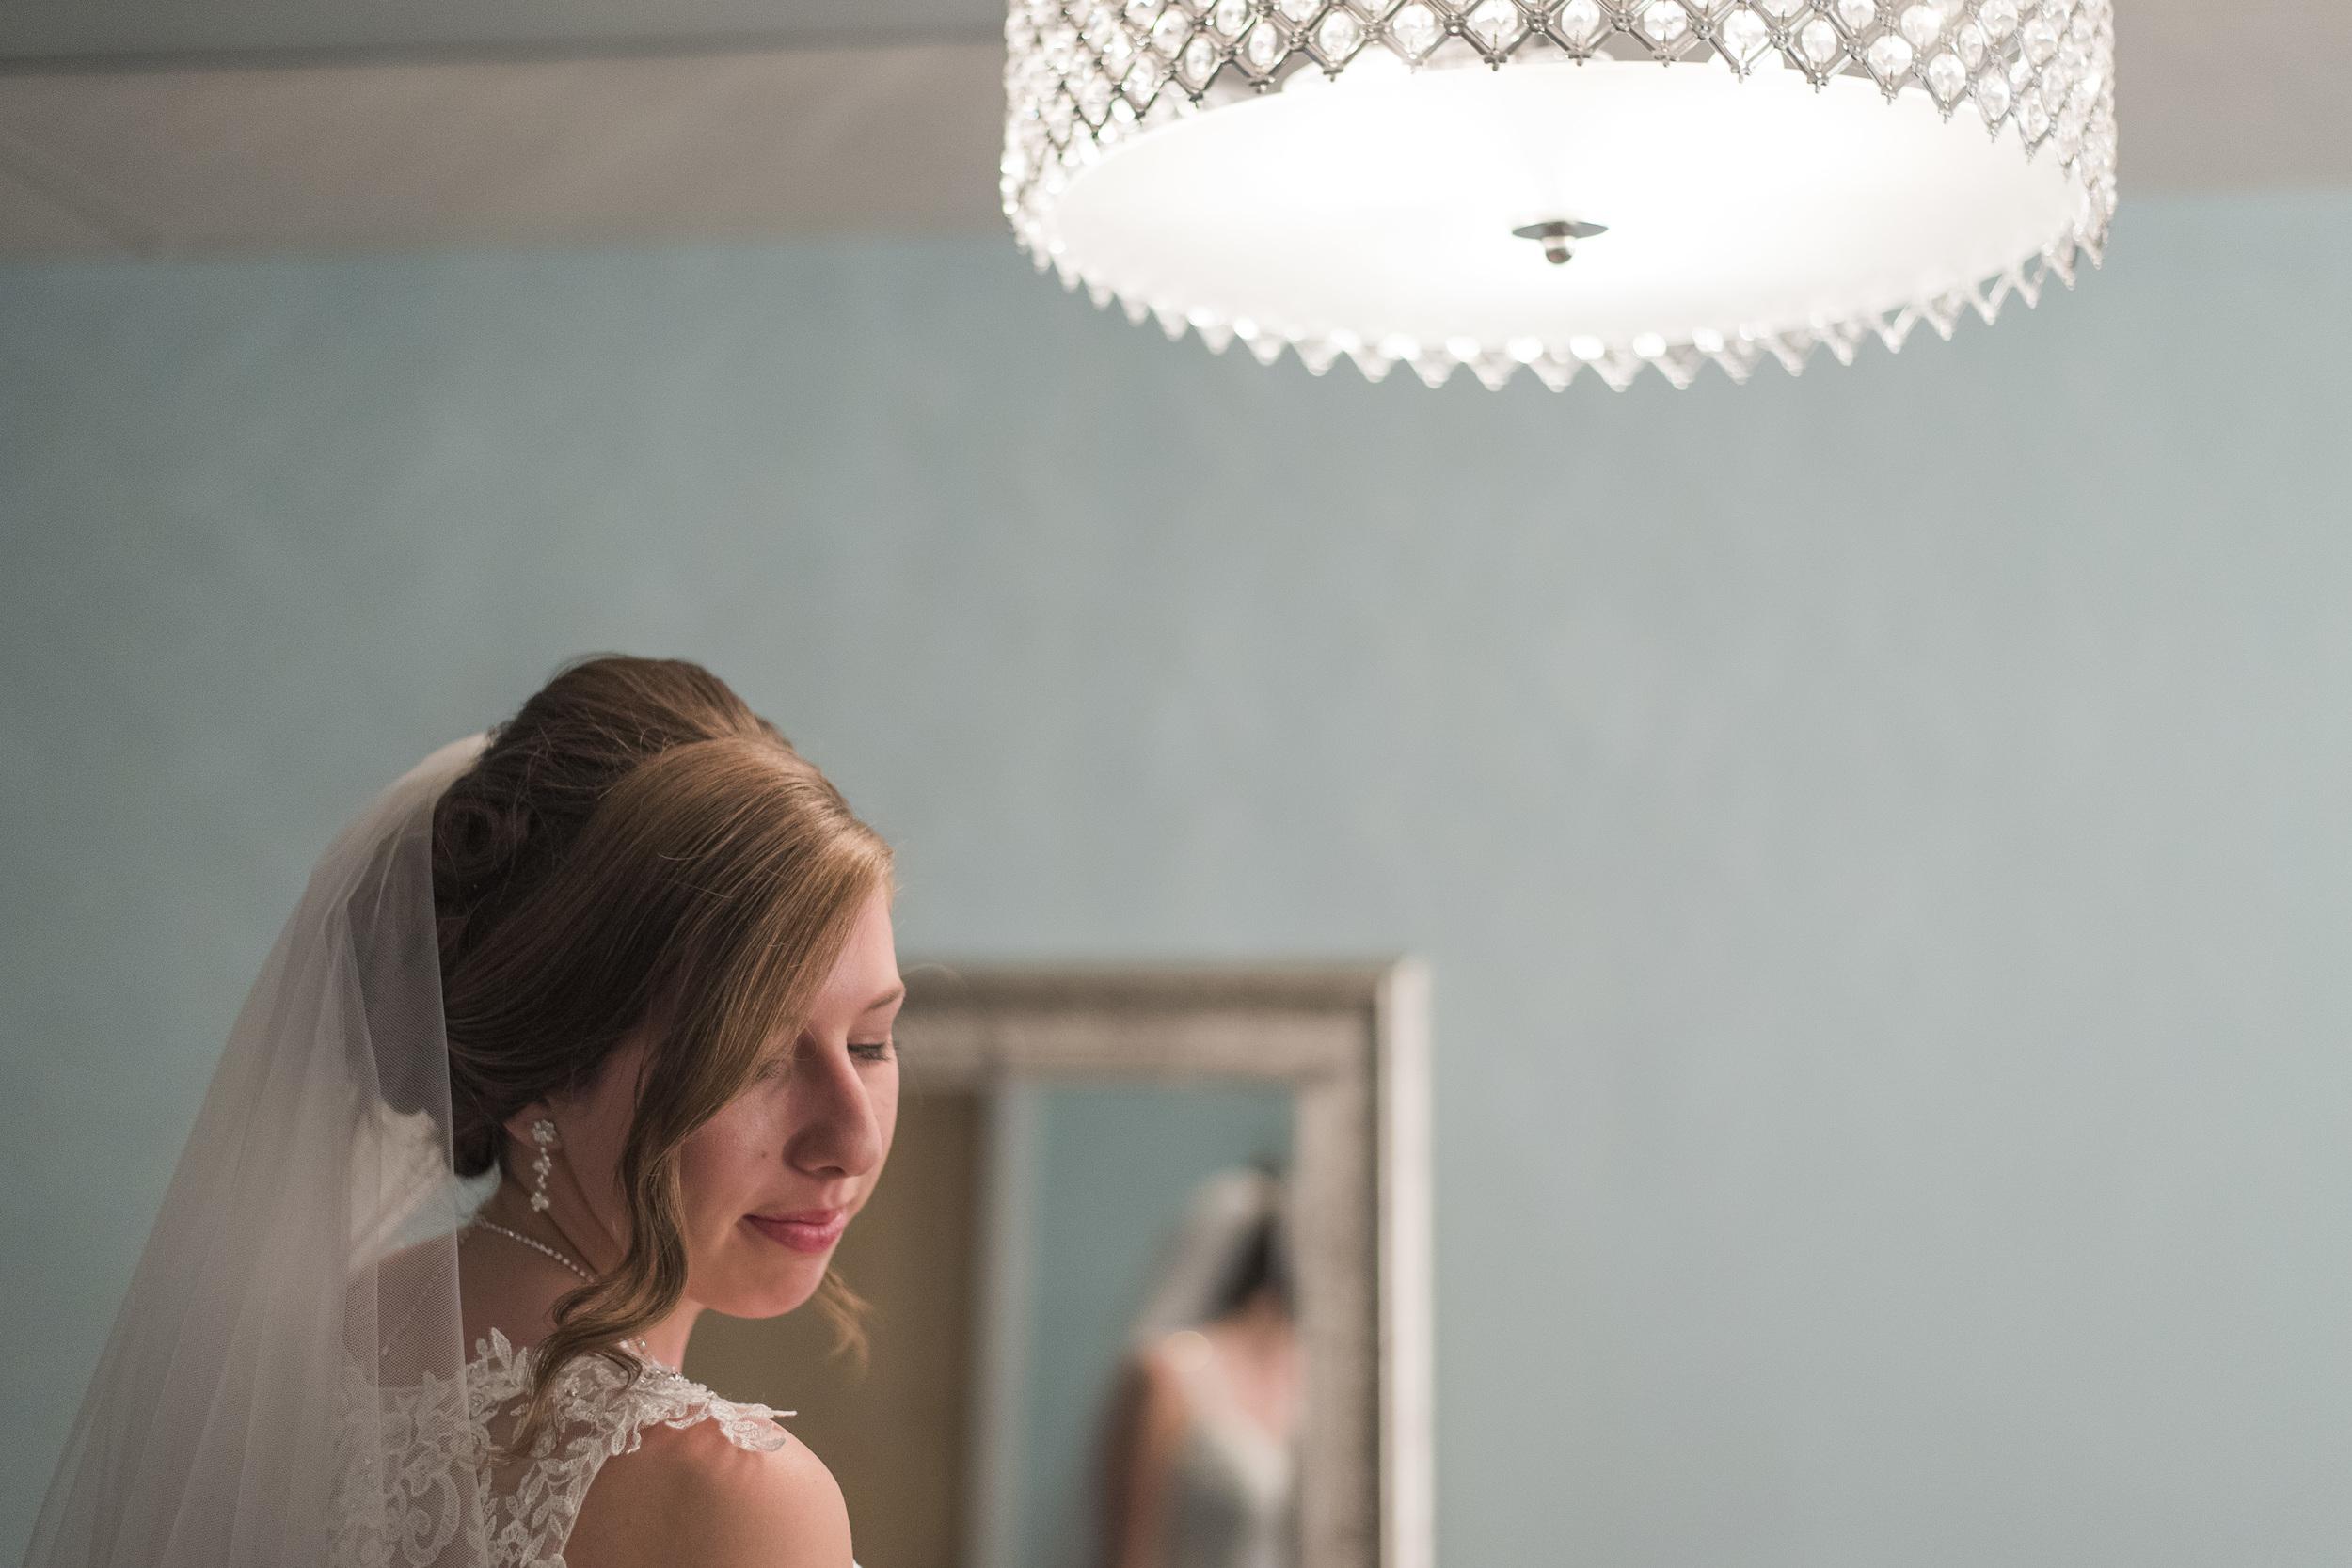 New_jersey_blue_heron_pines_wedding20150529_0539.jpg